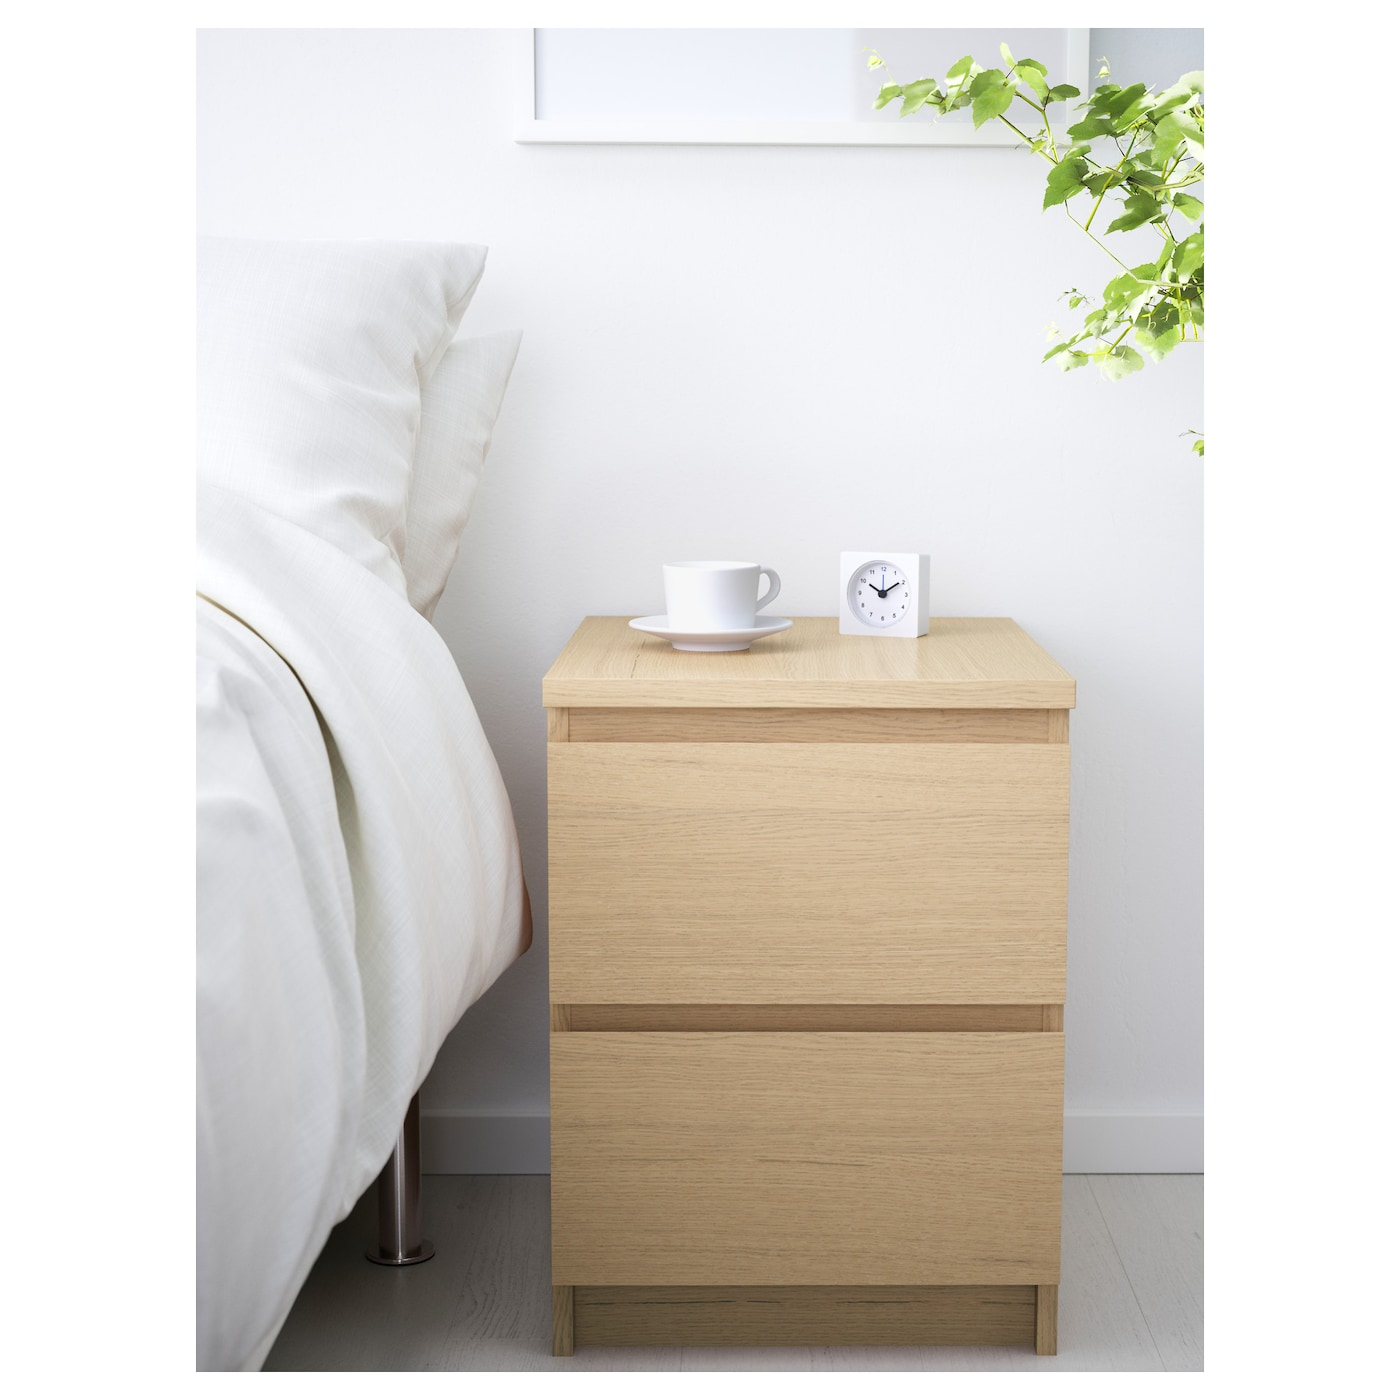 Malm 2 Drawer Chest White Stained Oak Veneer 15 3 4x21 5 8 Ikea